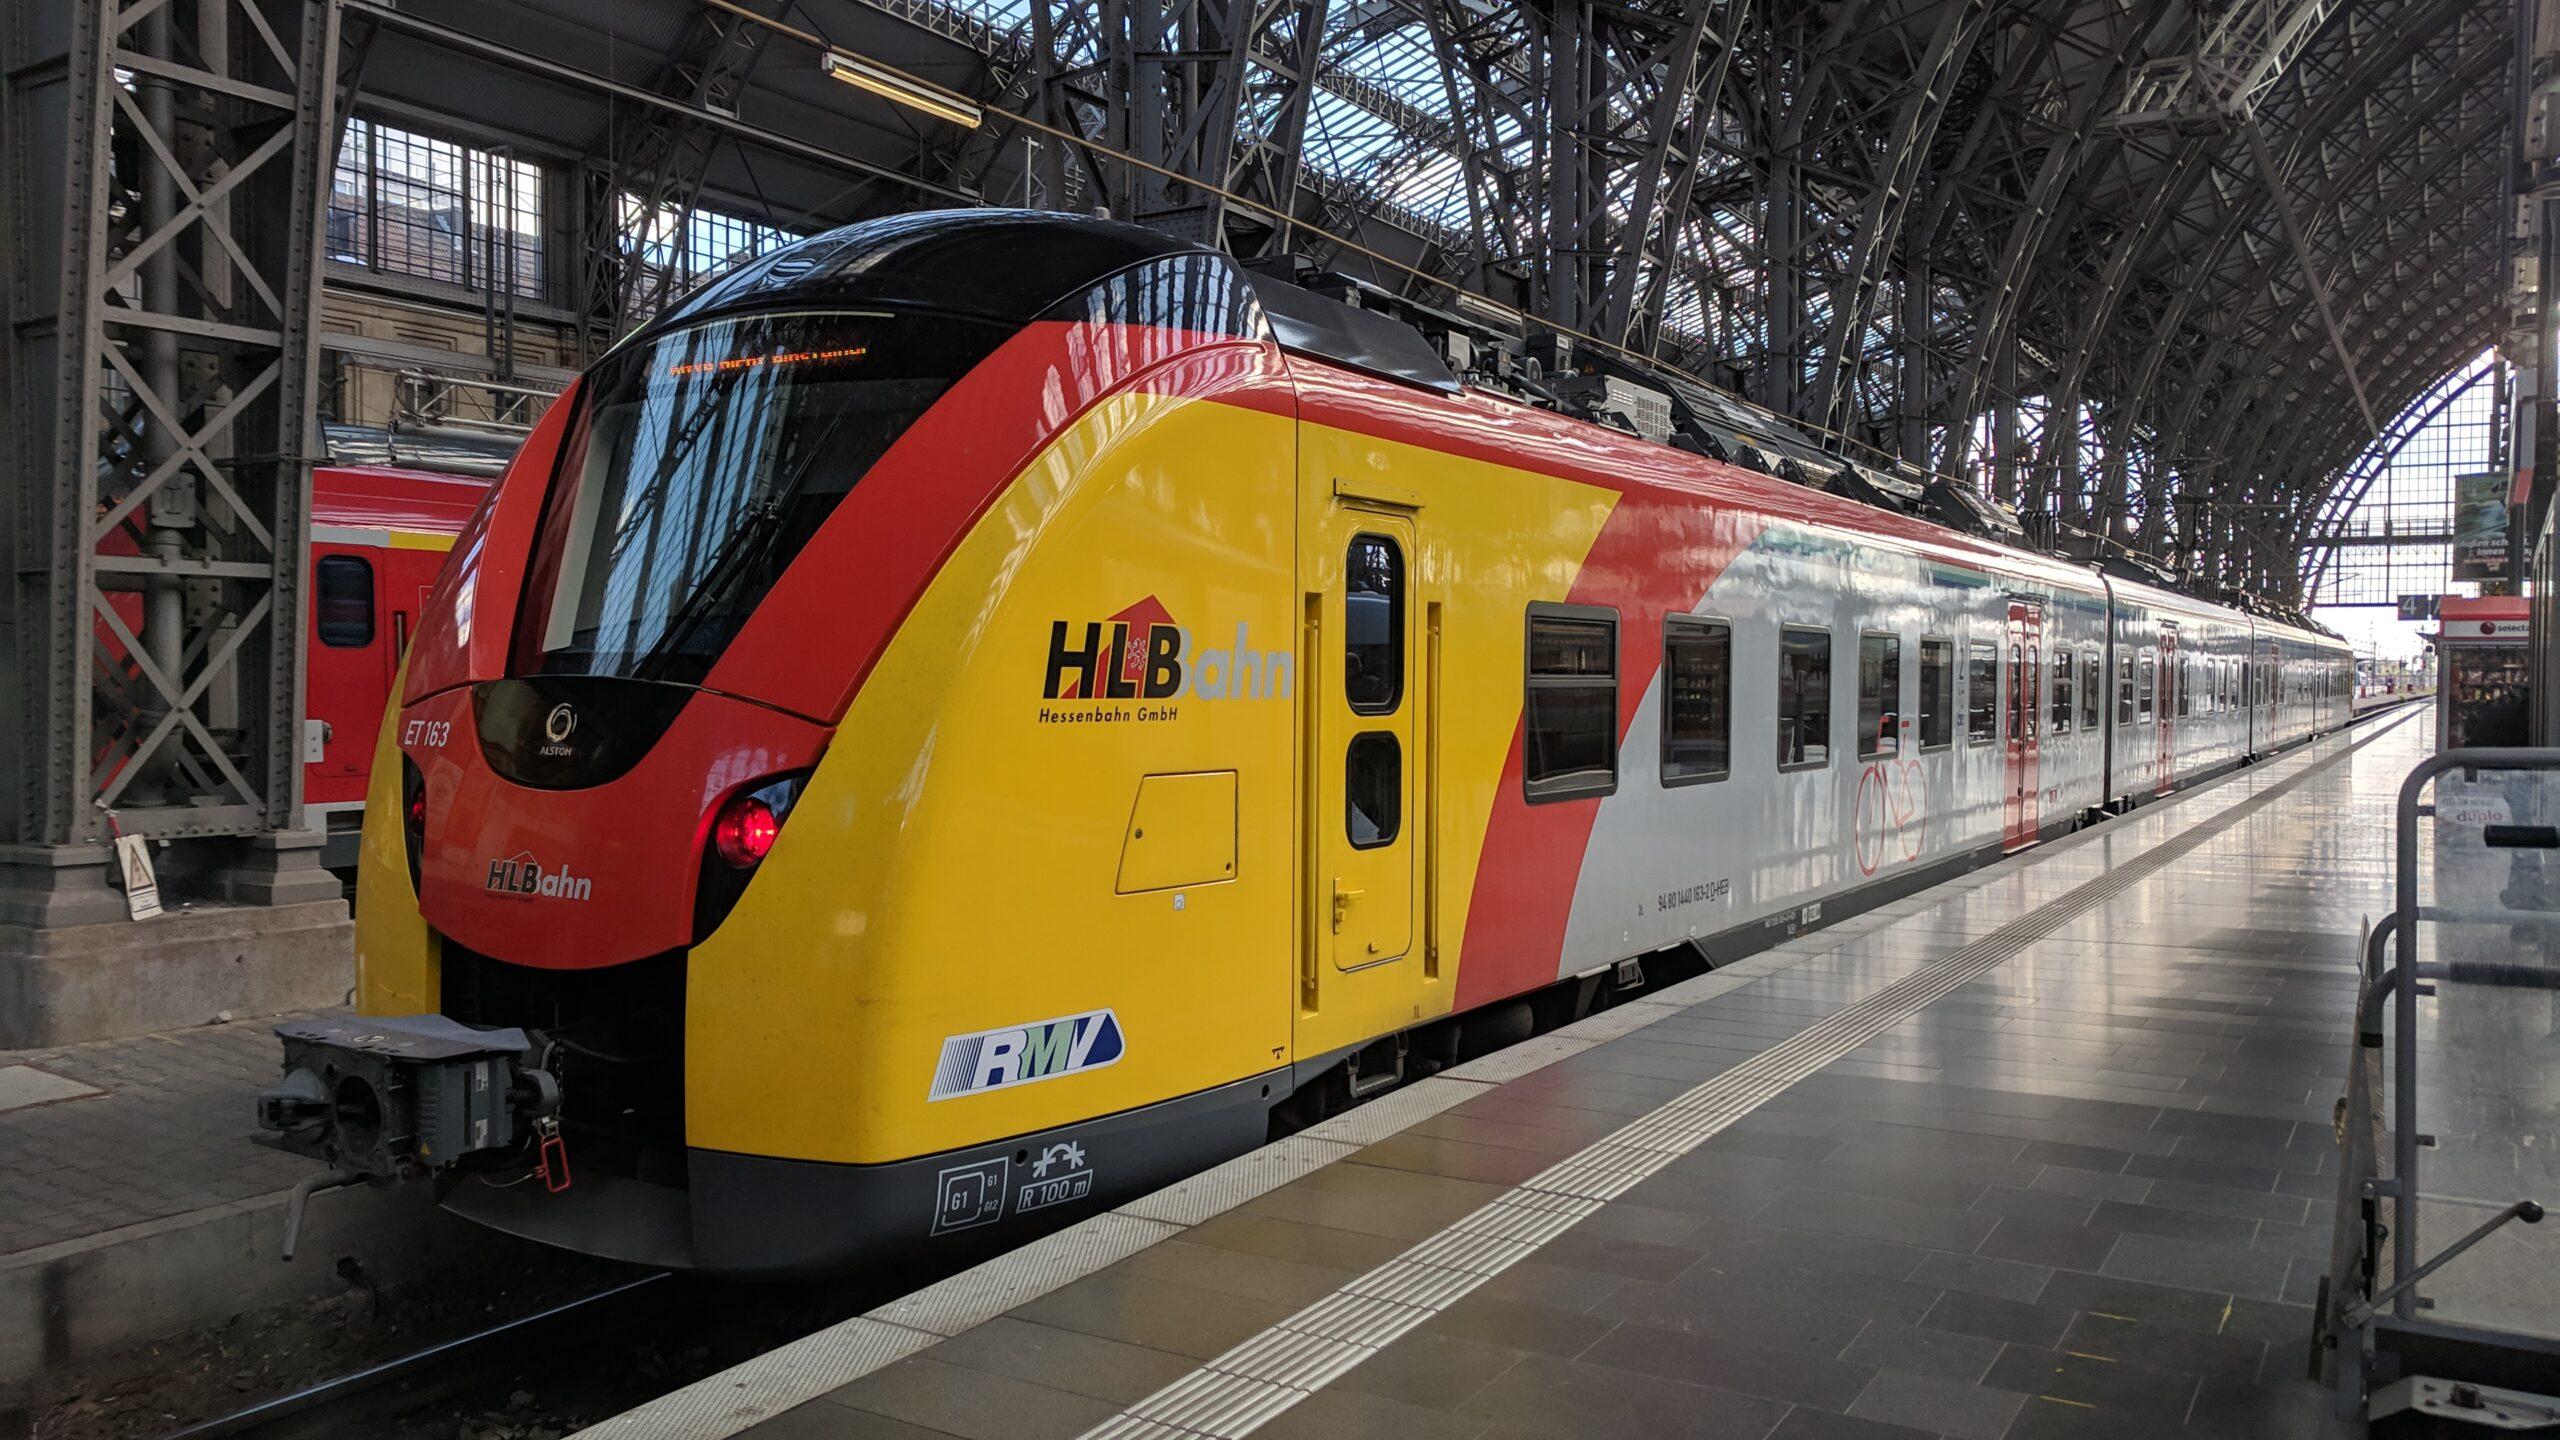 Alstom Coradia Continental for Hessische Landesbahn (HLB)